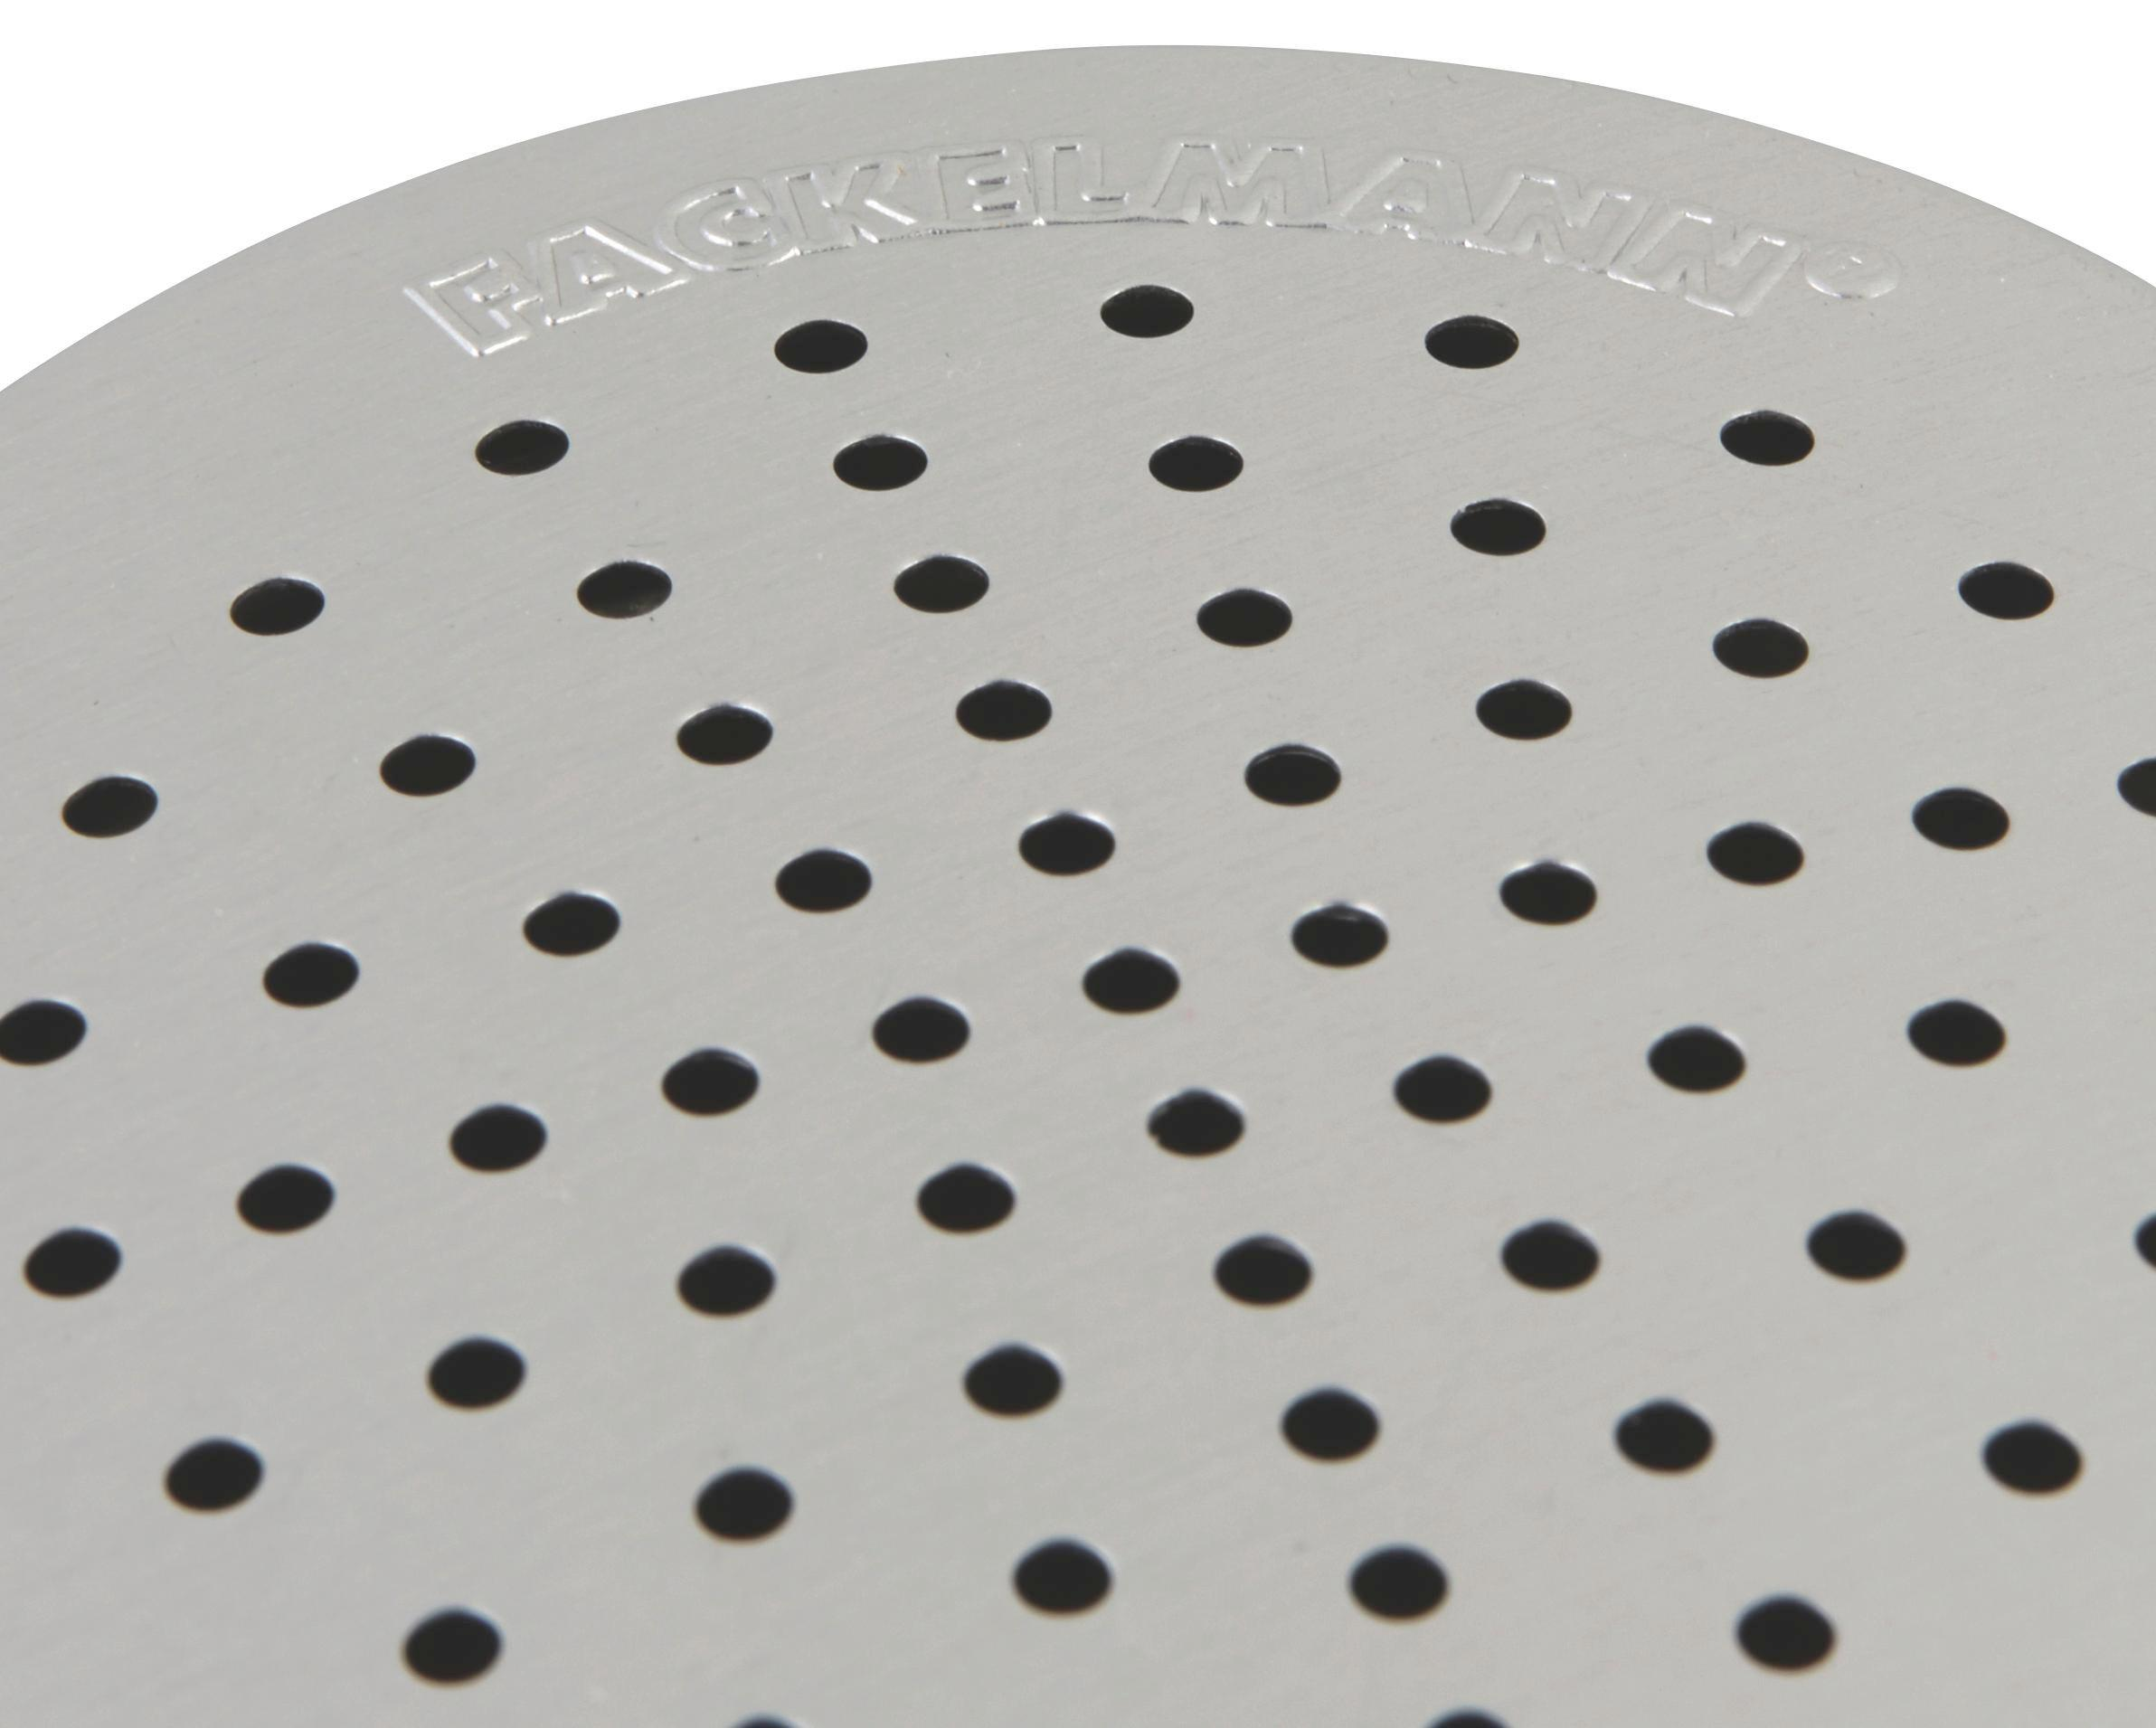 Profi-streuer Aluminium - Silberfarben, KONVENTIONELL, Metall (7/11,5cm) - FACKELMANN